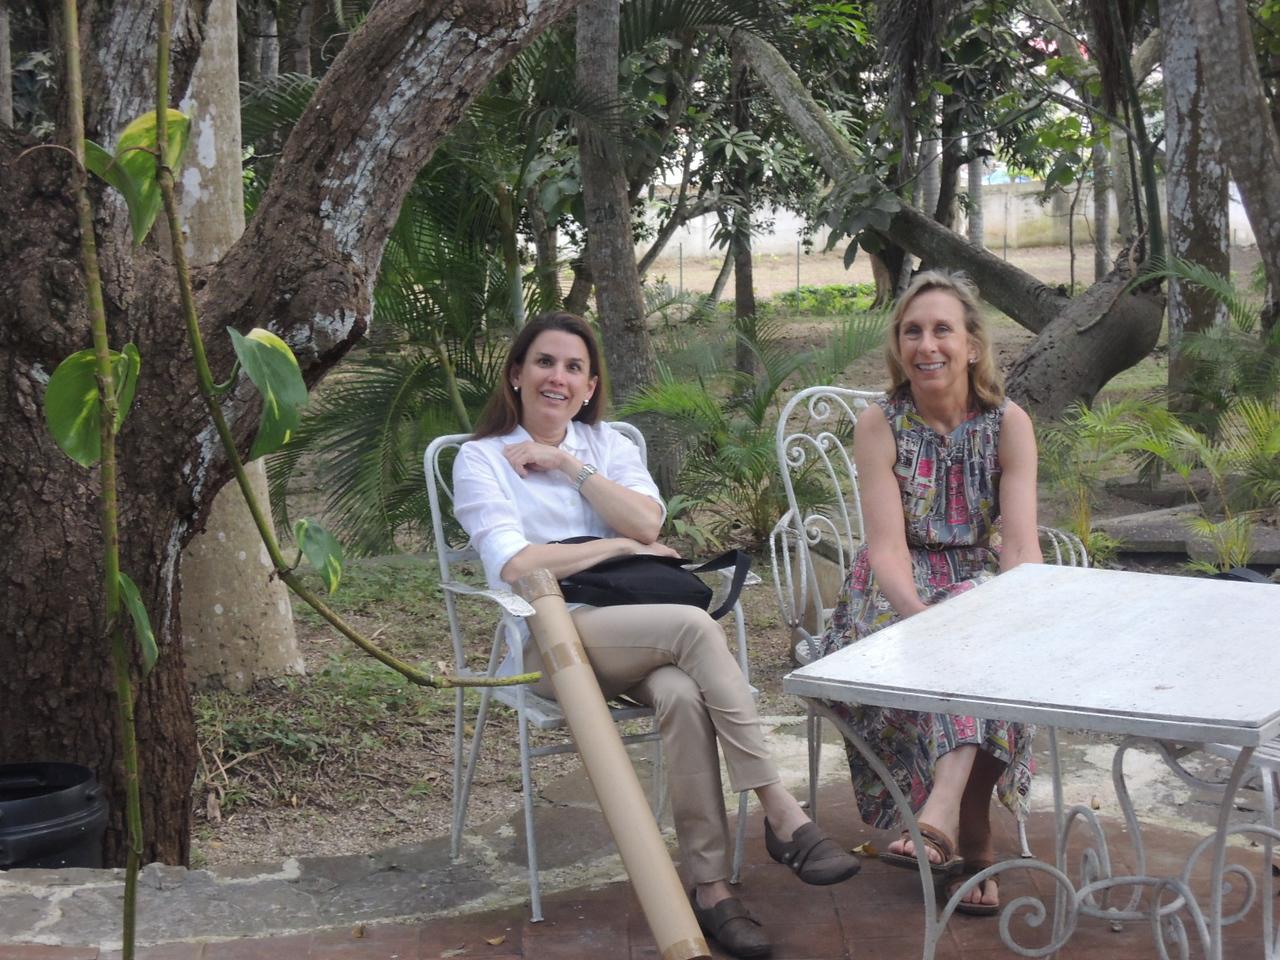 Elaine and Patty enjoying the poolside.